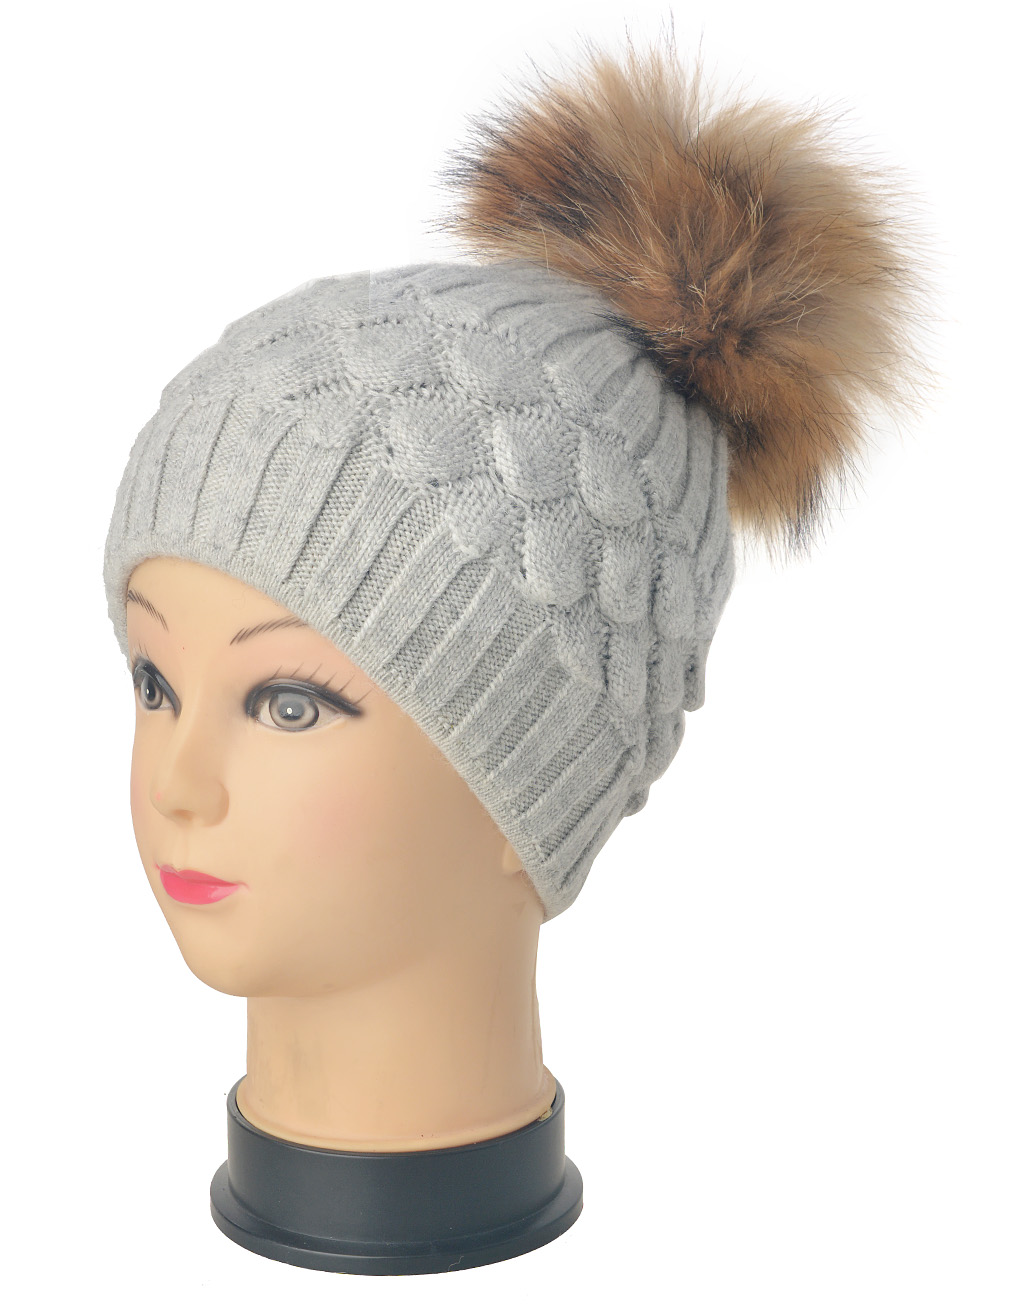 Real Fur Pompom Beanie Hat Wholesale Price   Discount f82745f3b4c